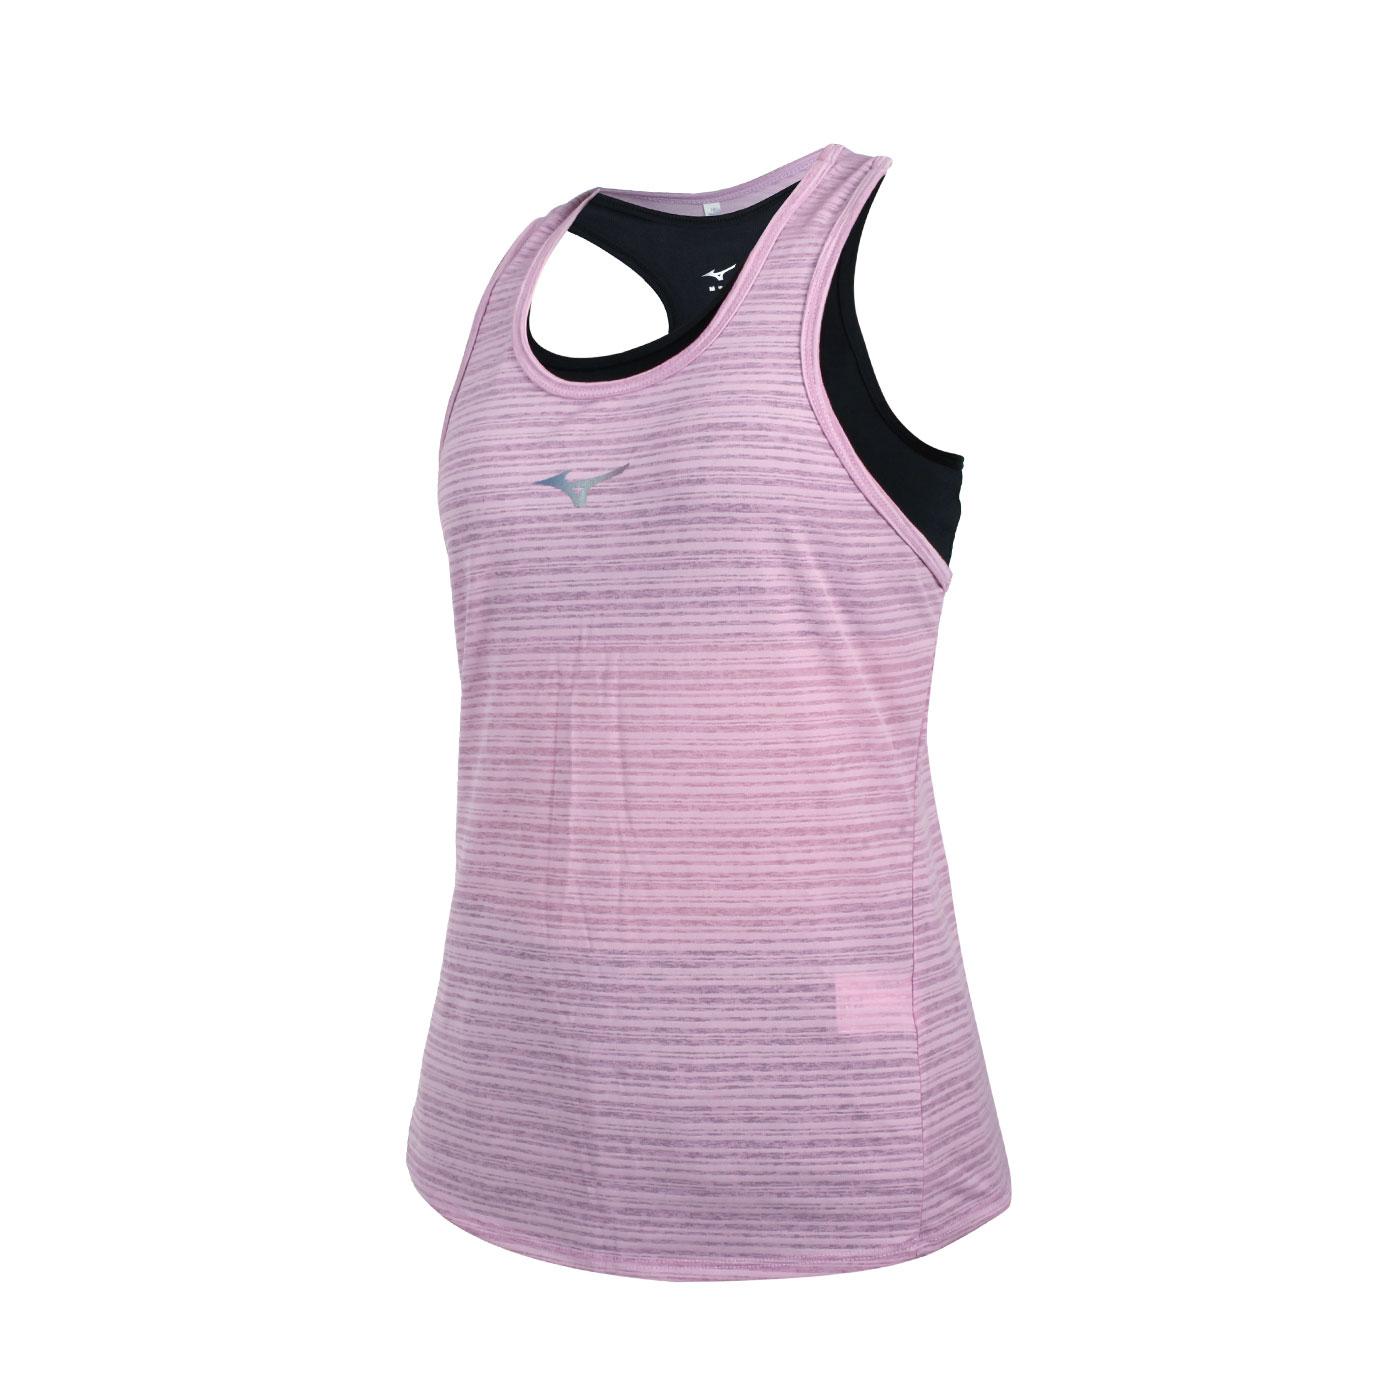 MIZUNO 女款兩件式瑜珈背心 K2TA120466 - 藕紫銀黑